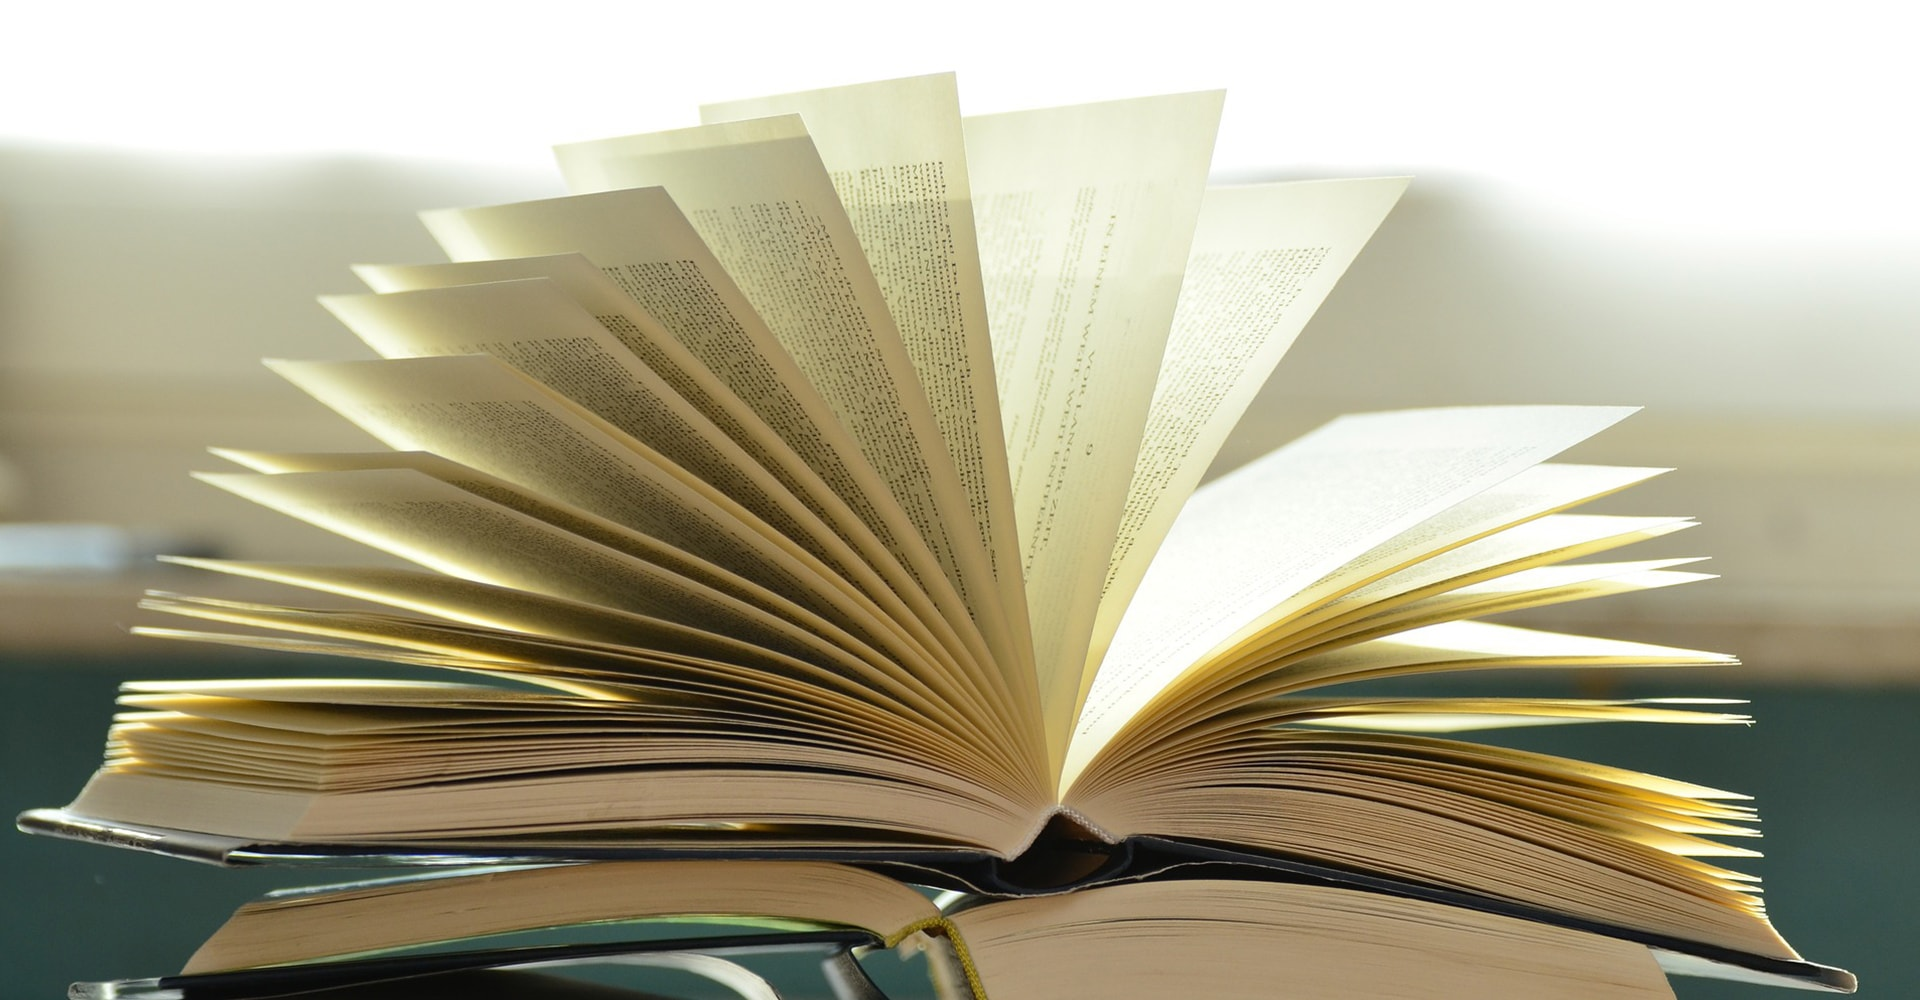 Offenes Buch zu den Fortbildungen der Pflegeschule ToP GbR